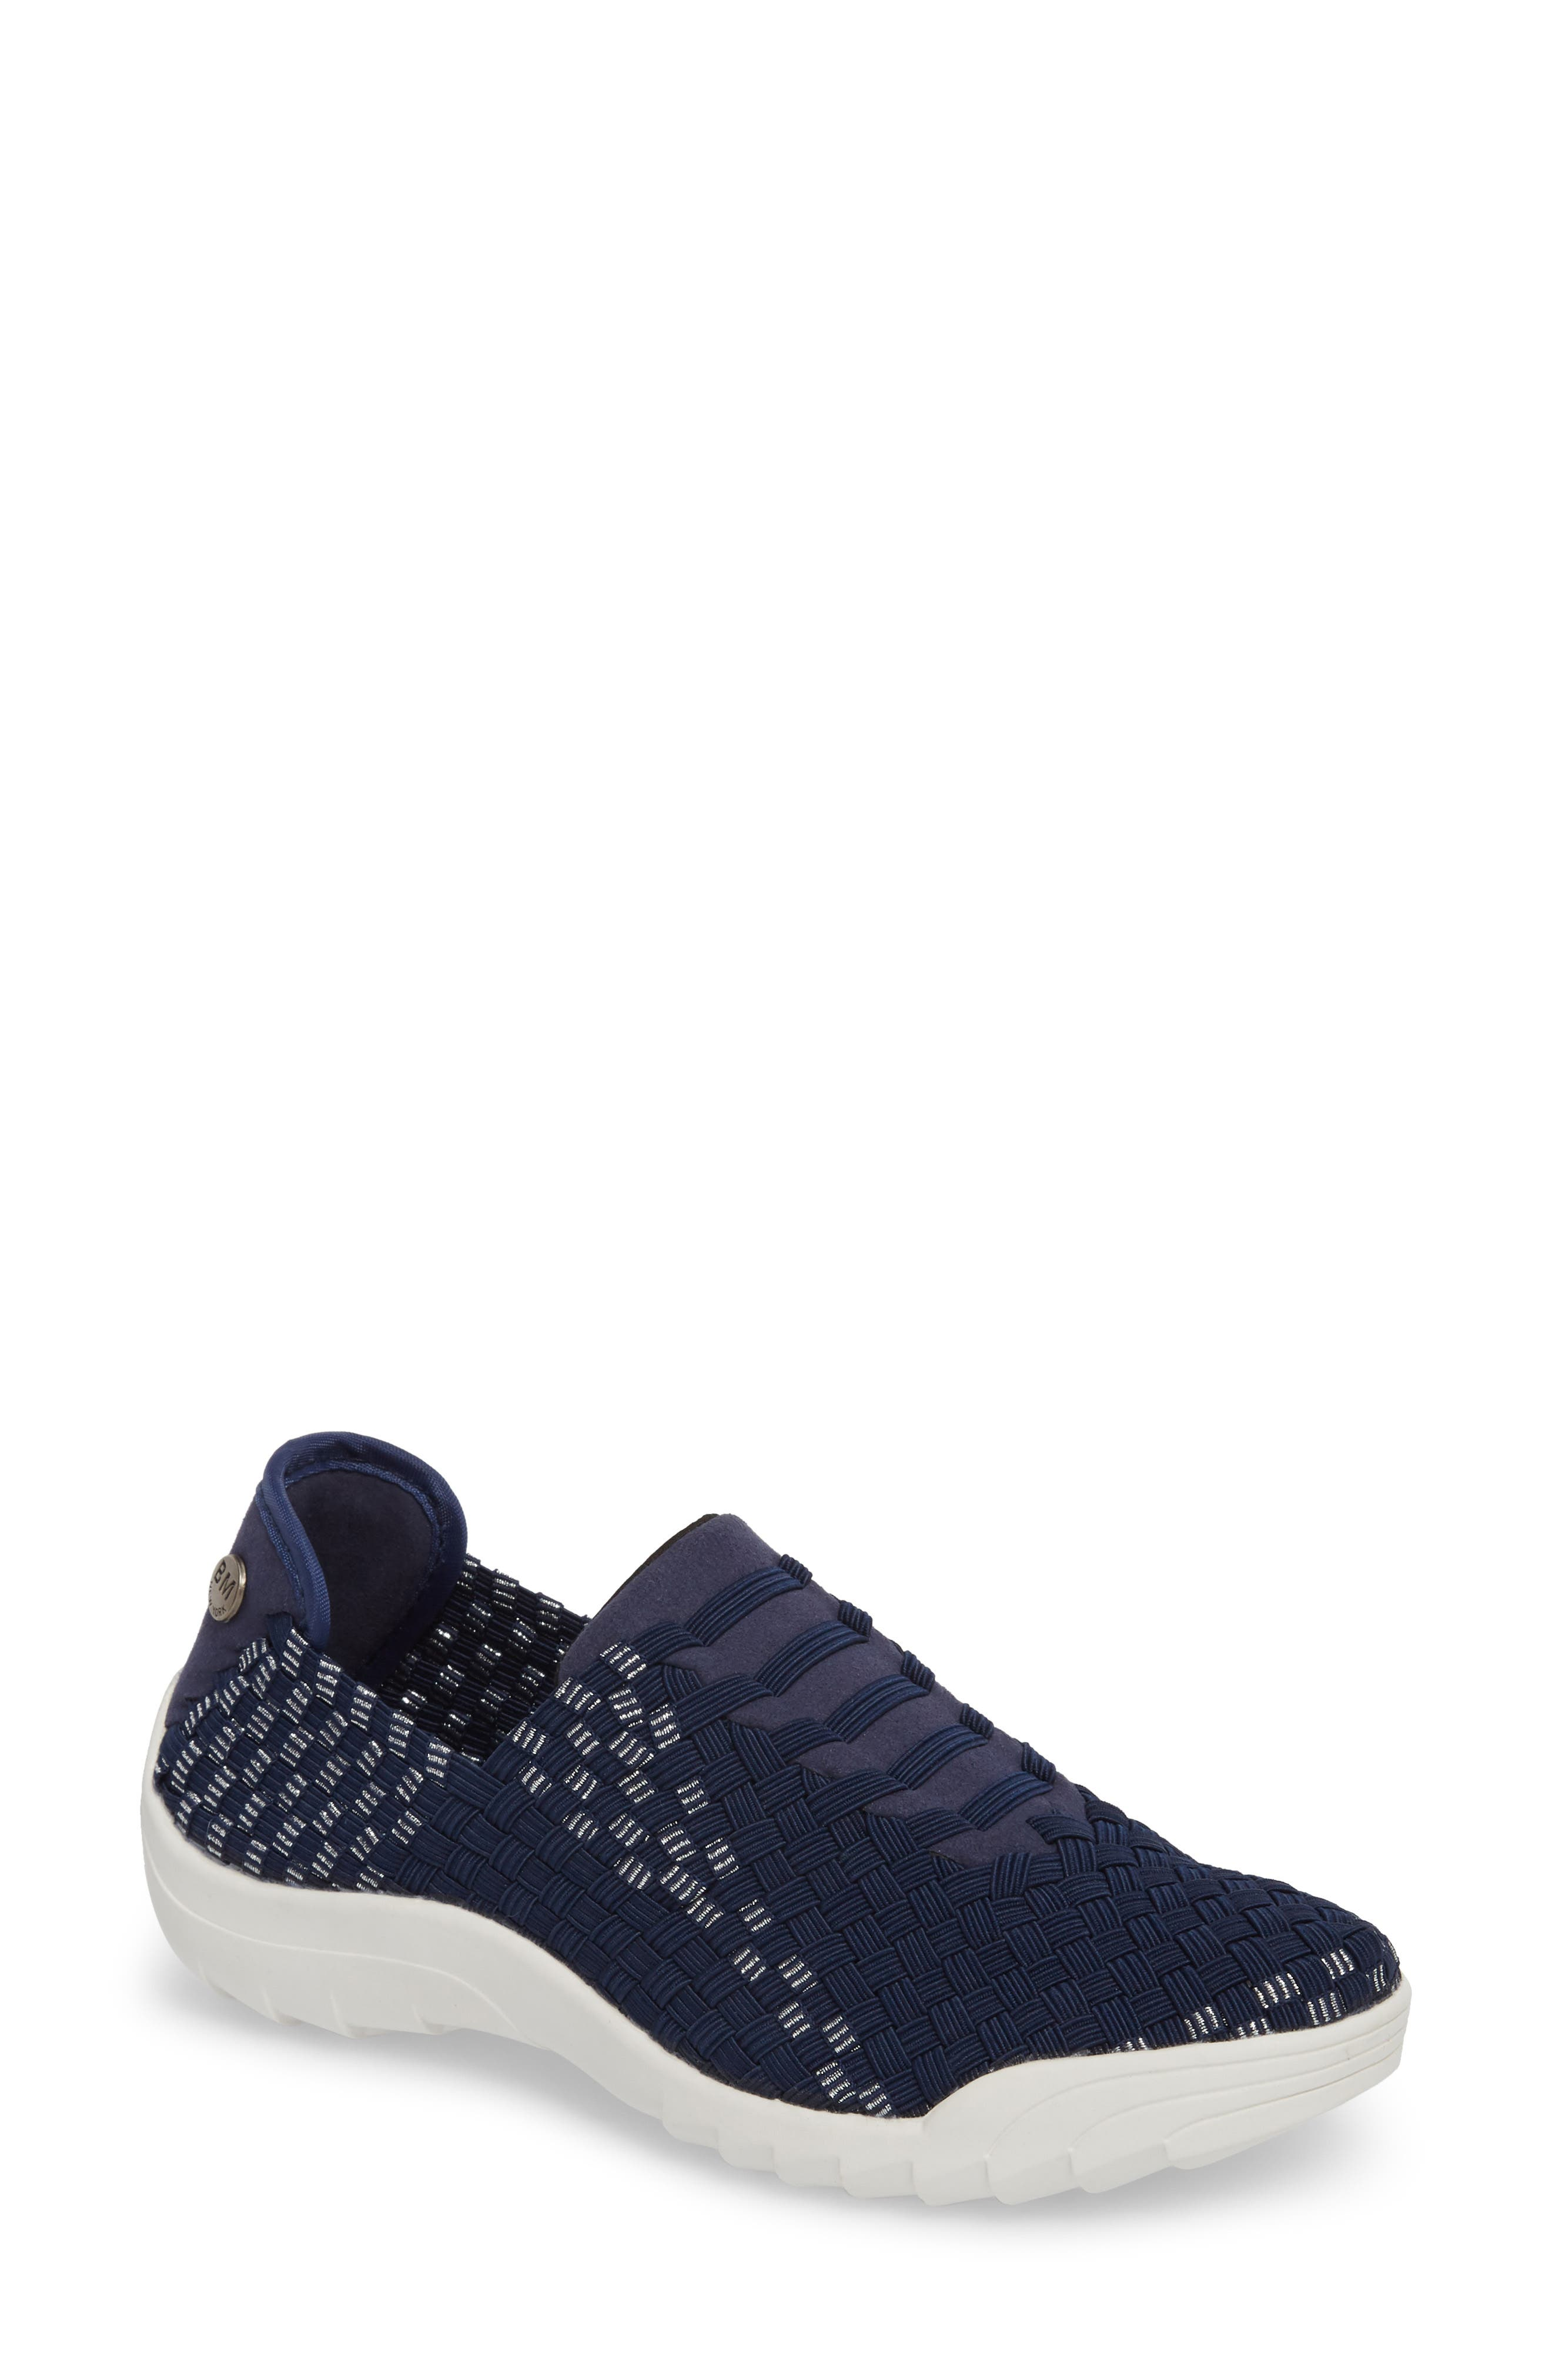 Rigged Vivaldi Slip-On Sneaker,                             Main thumbnail 1, color,                             Navy Lurex